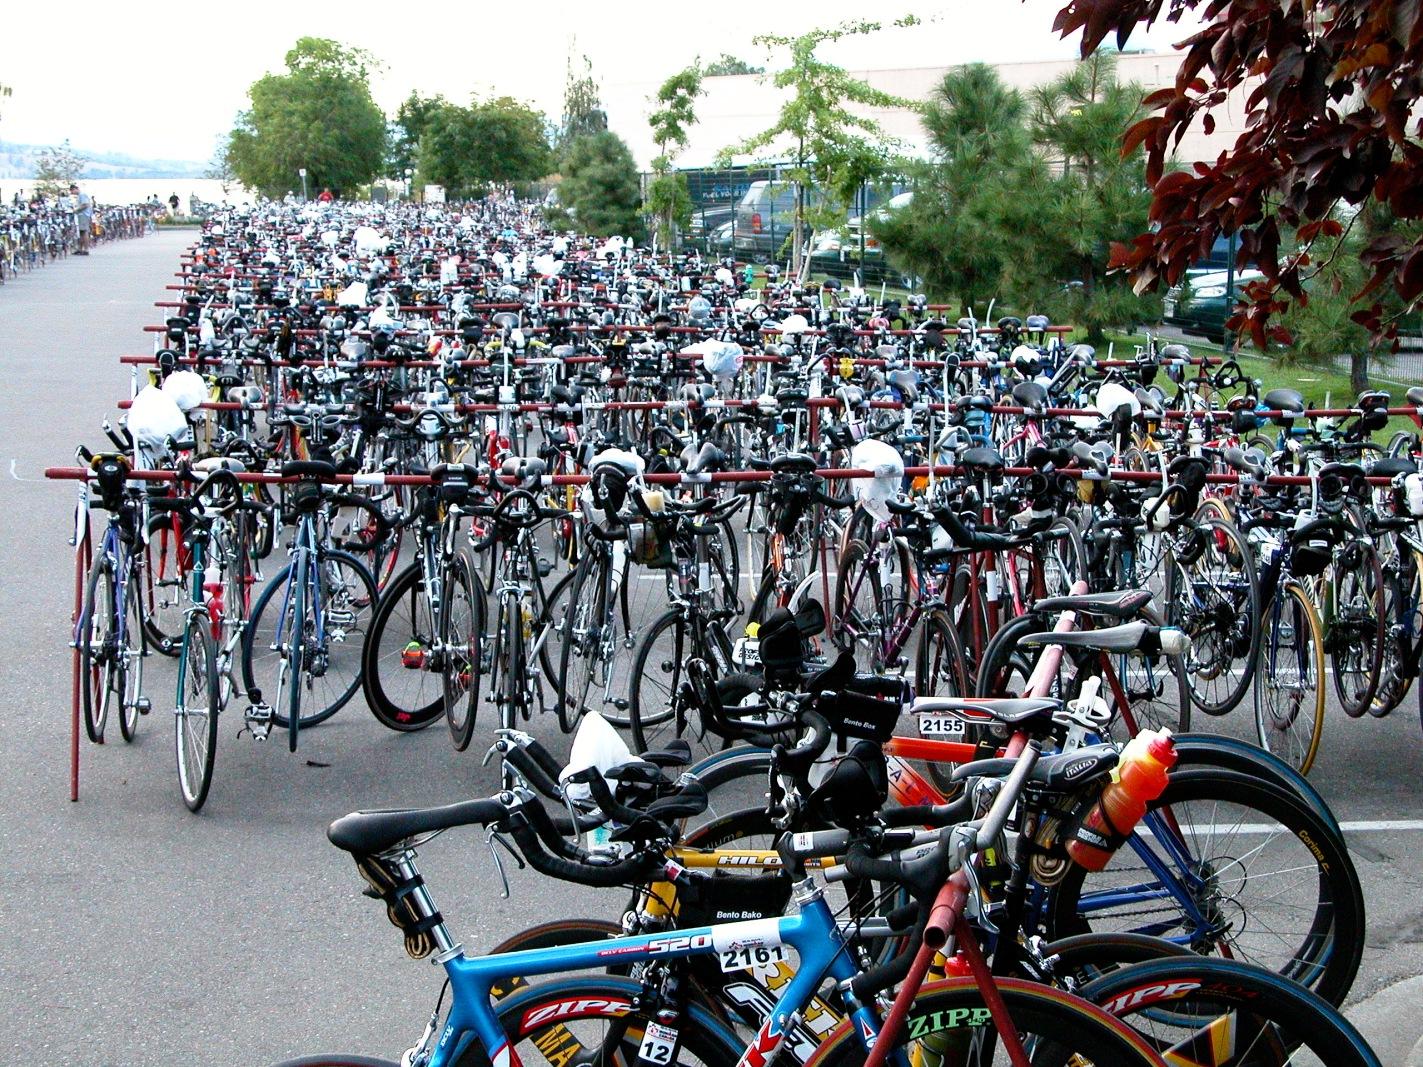 Ocean of bikes by Miloliidrifter